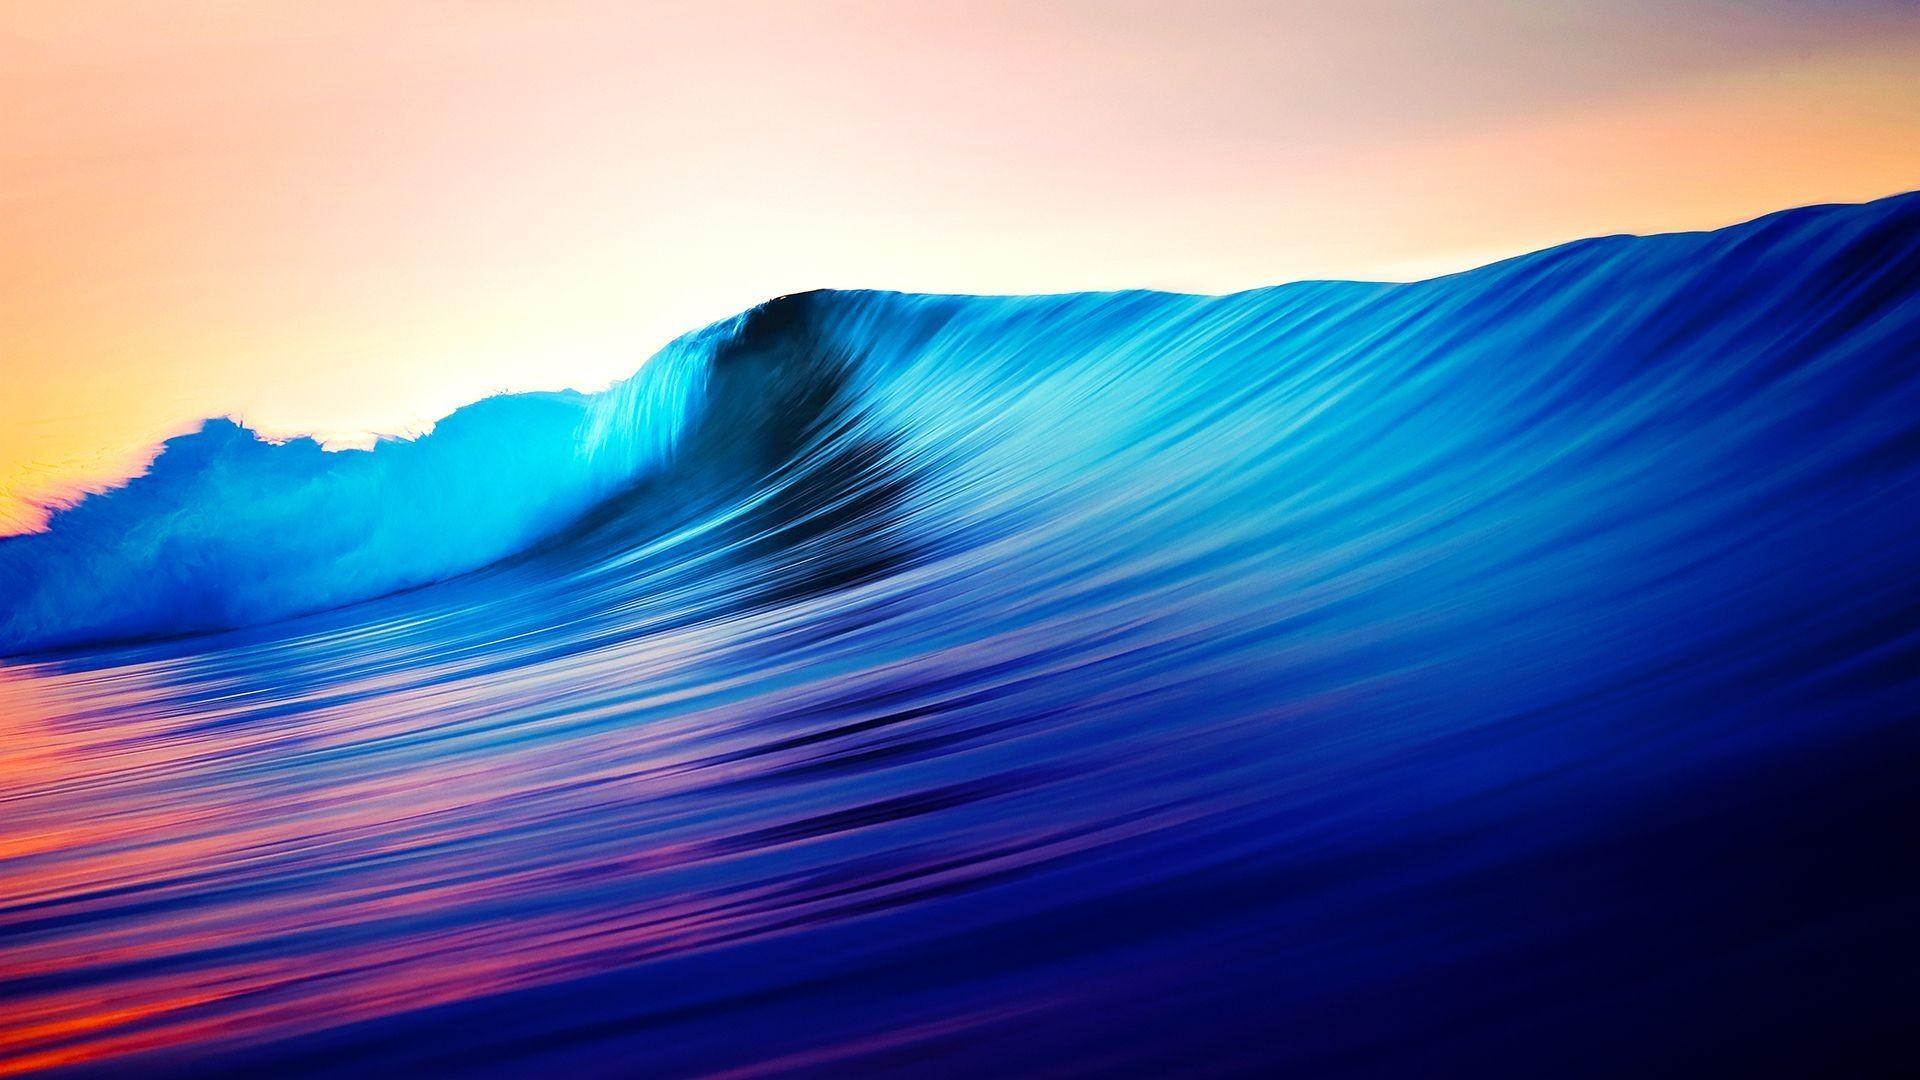 Image from  https://cdn01.wallconvert.com/_media/wallpapers_1920x1080/1/2/colorful-waves-19076.jpg.  | Waves | Pinterest